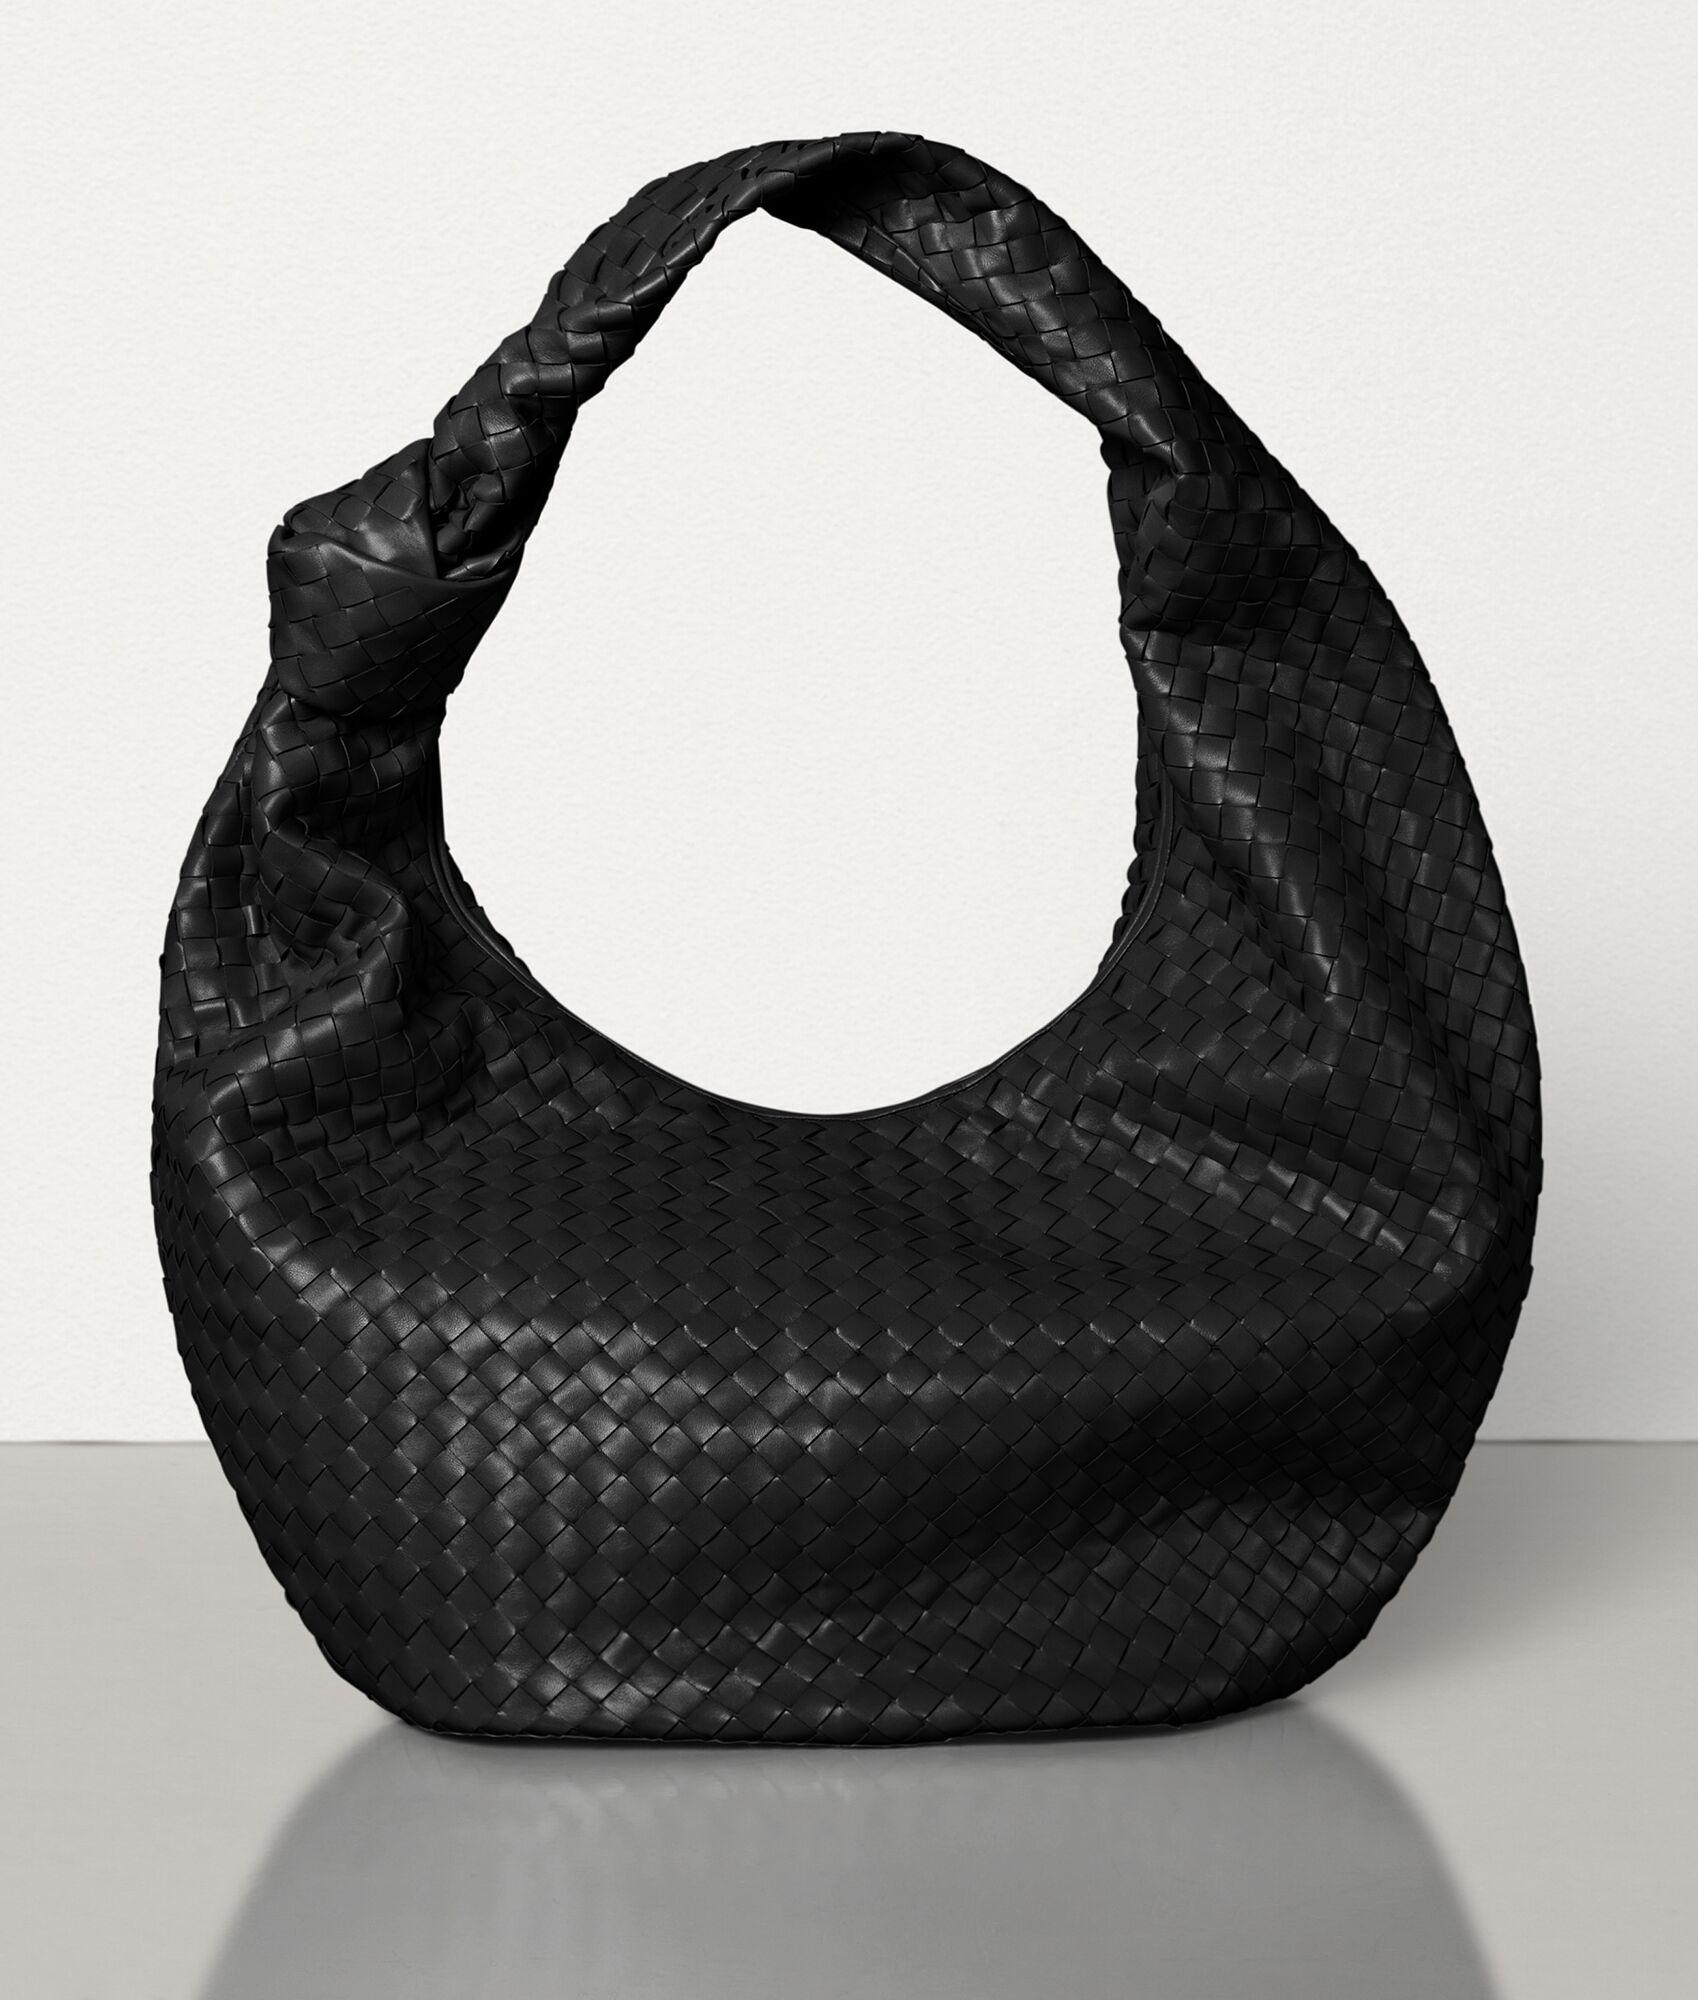 JODIE by Bottega Veneta, available on bottegaveneta.com for $6 Kendall Jenner Bags Exact Product